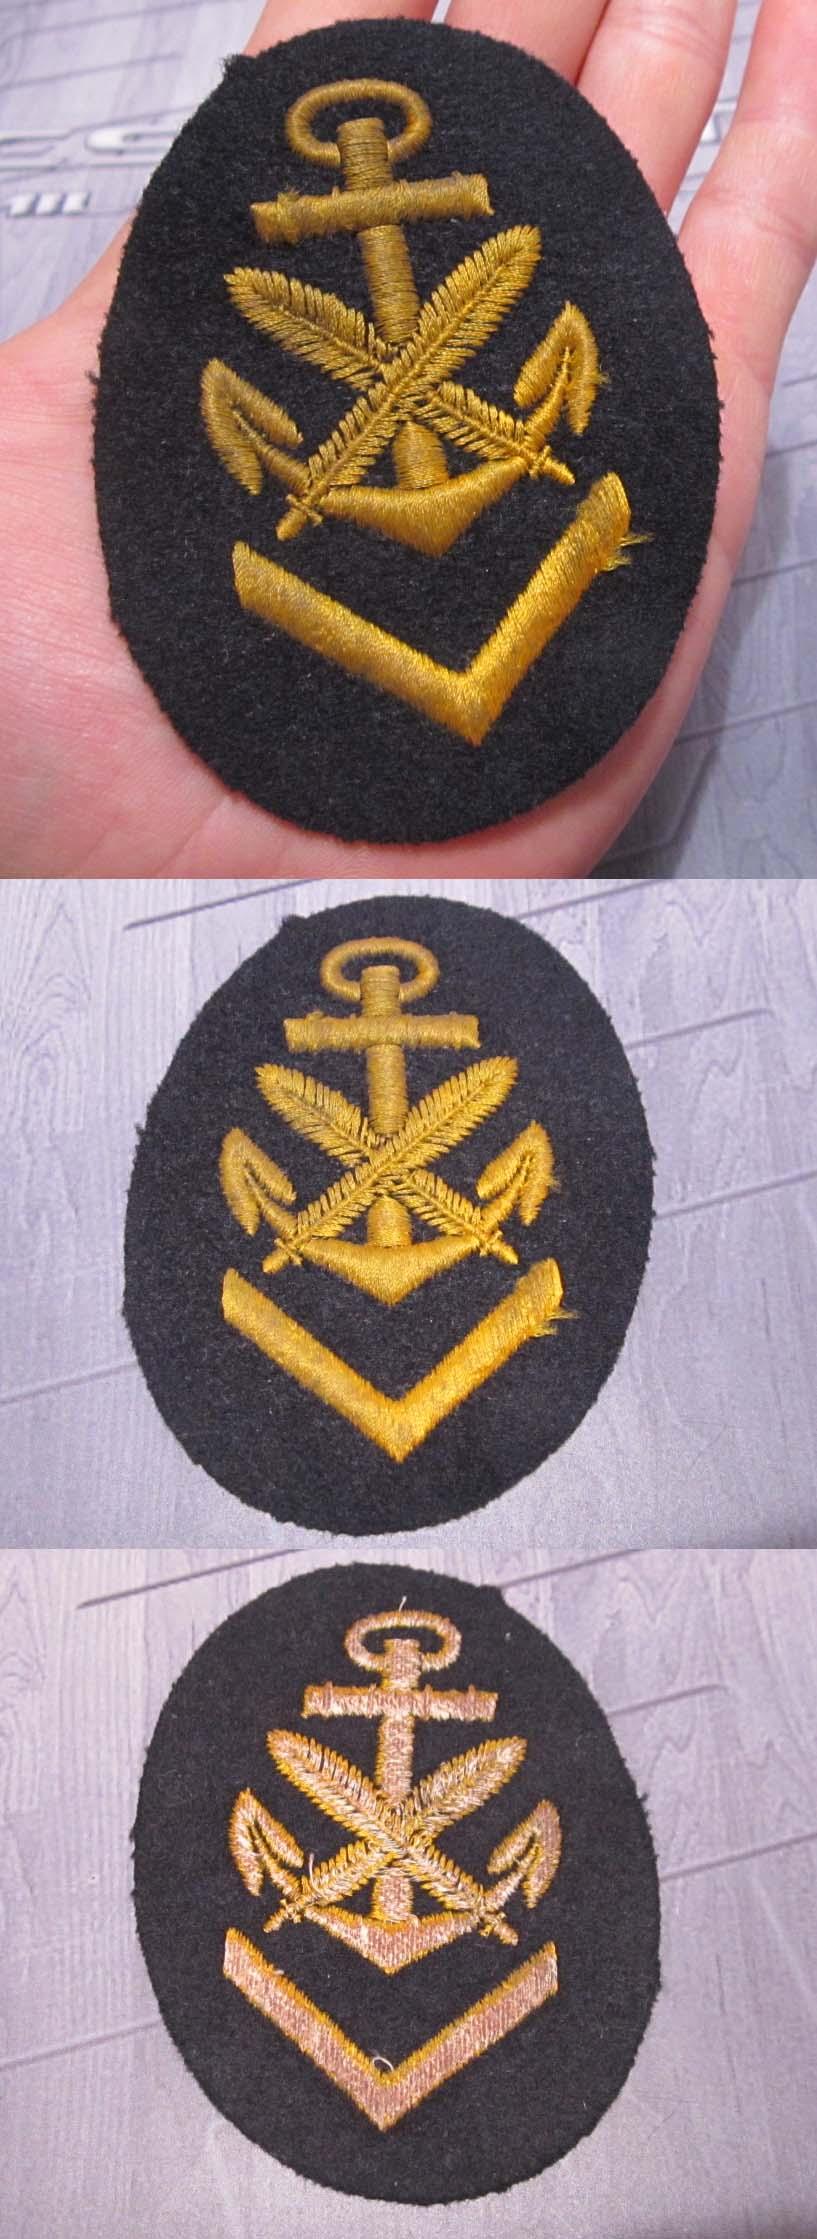 Senior Clerical Career Sleeve Insignia